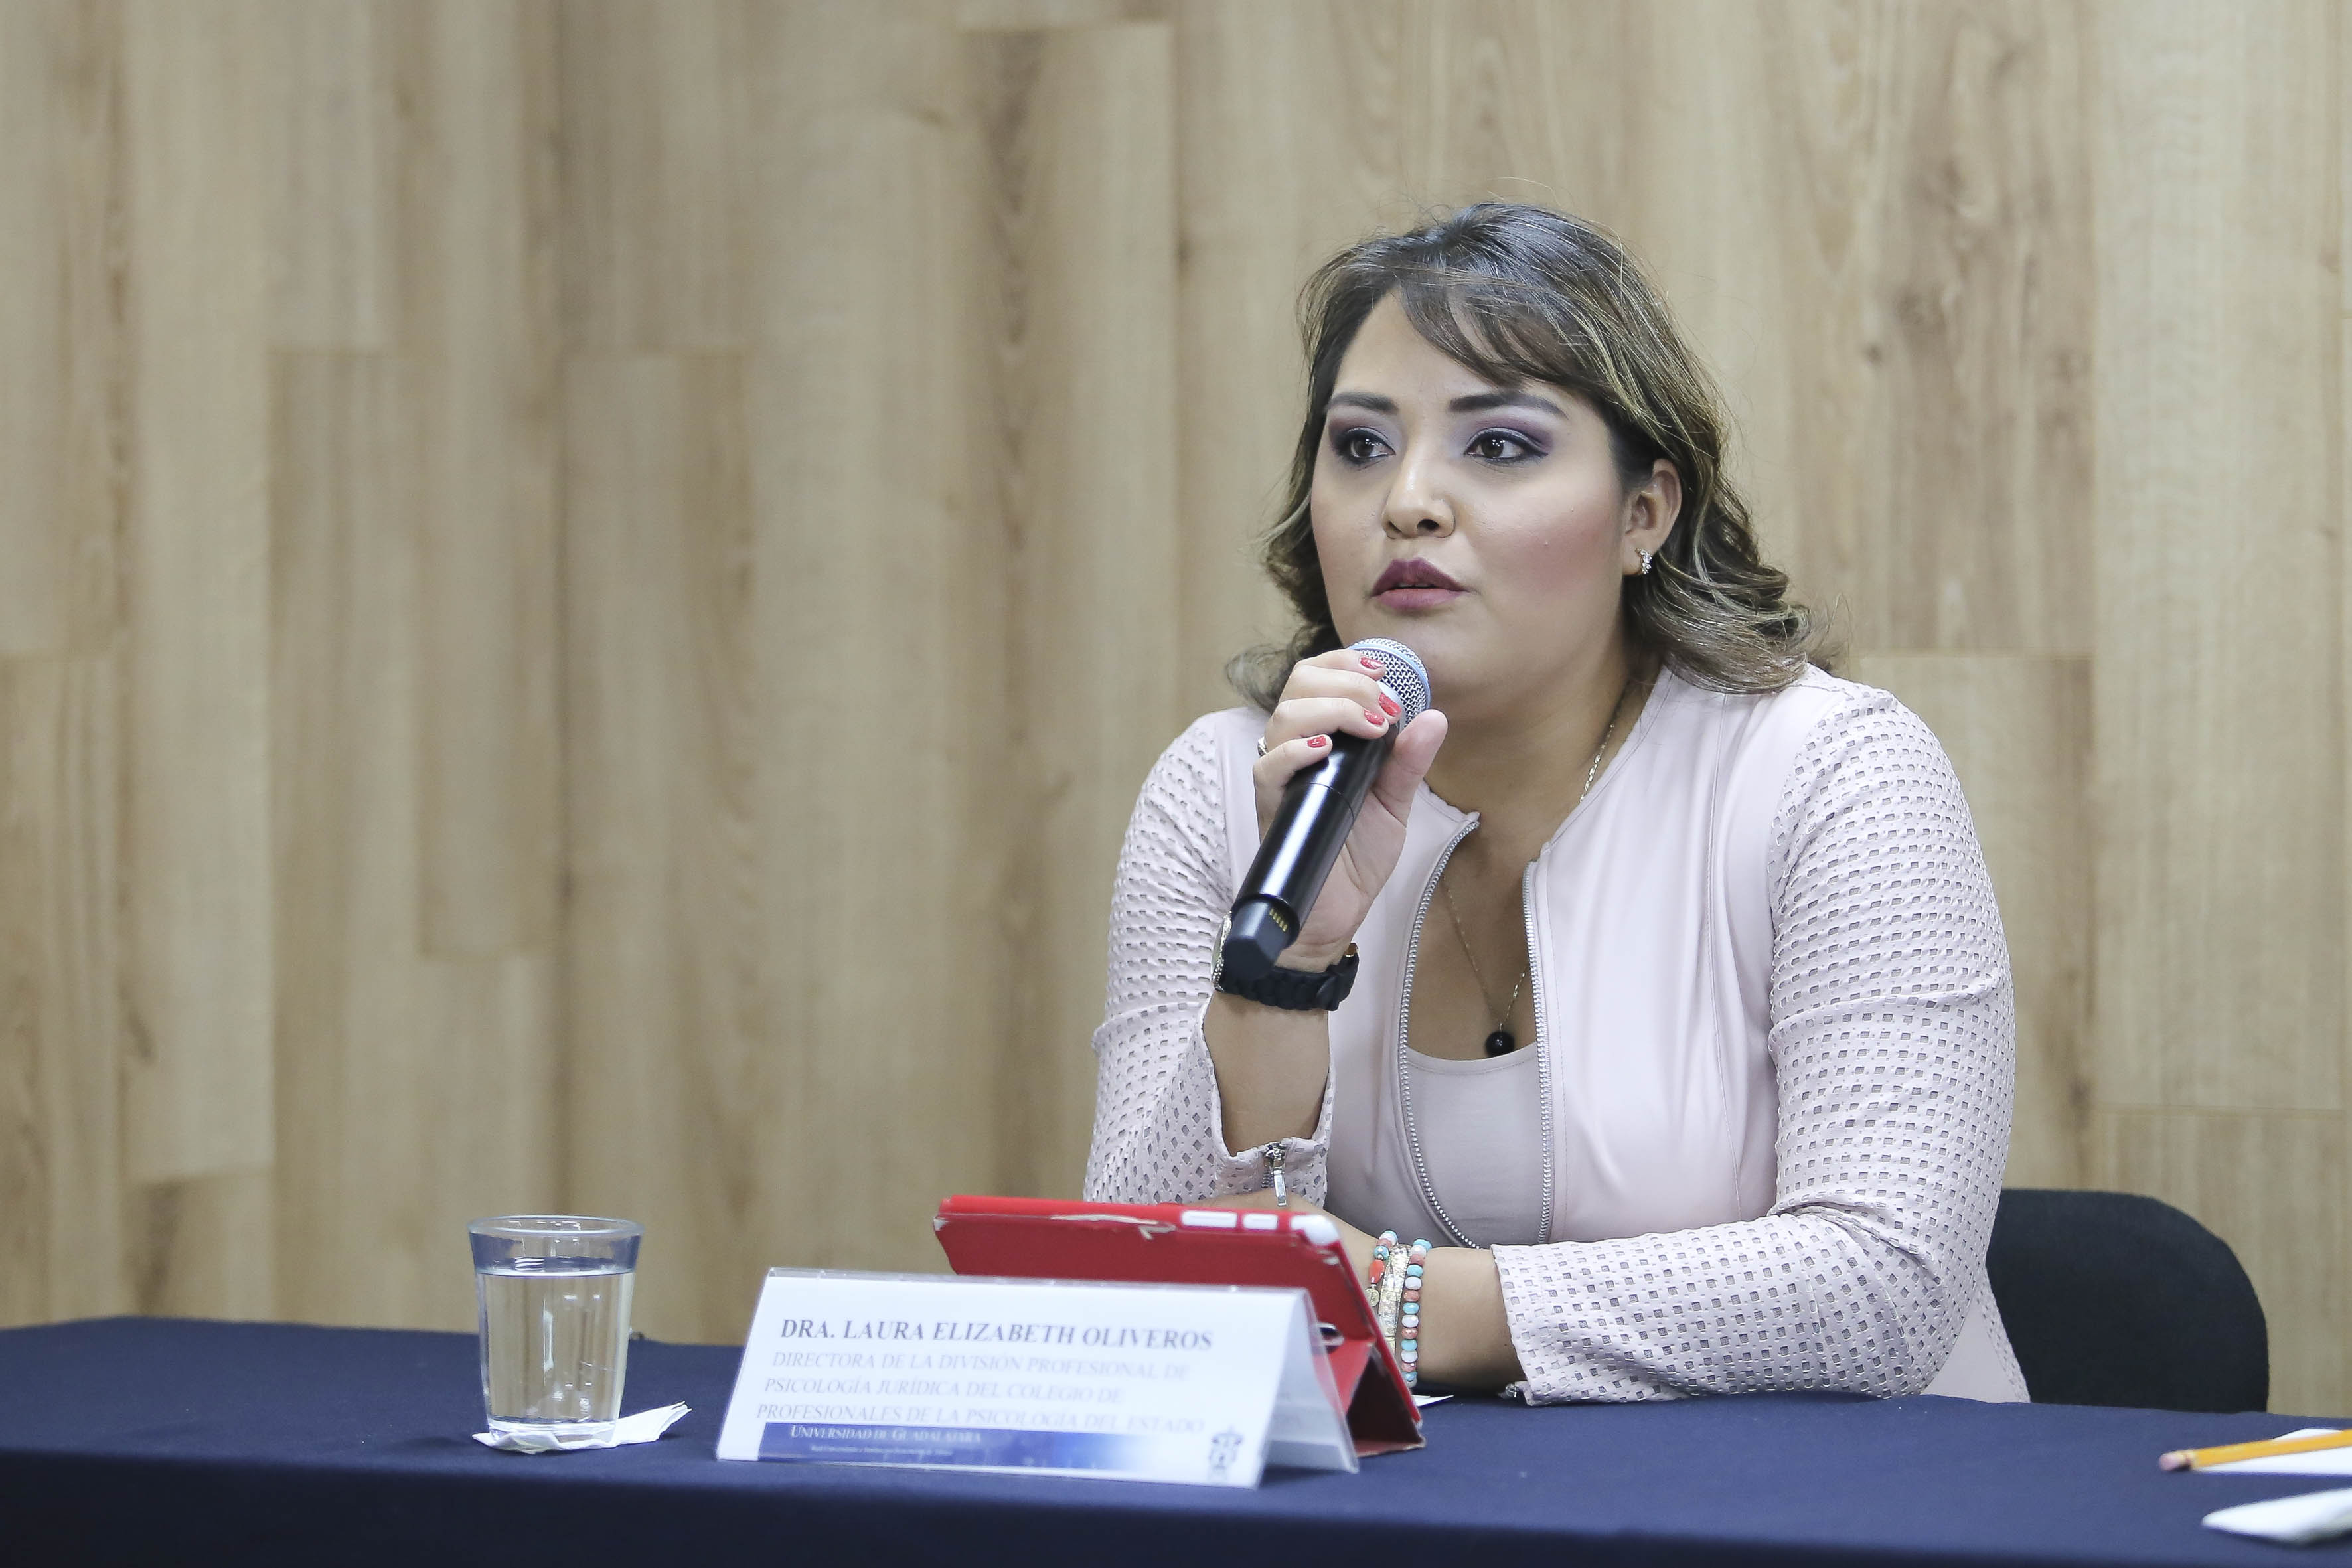 Al micrófono la Dra. Laura Elizabeth Oliveros Chávez